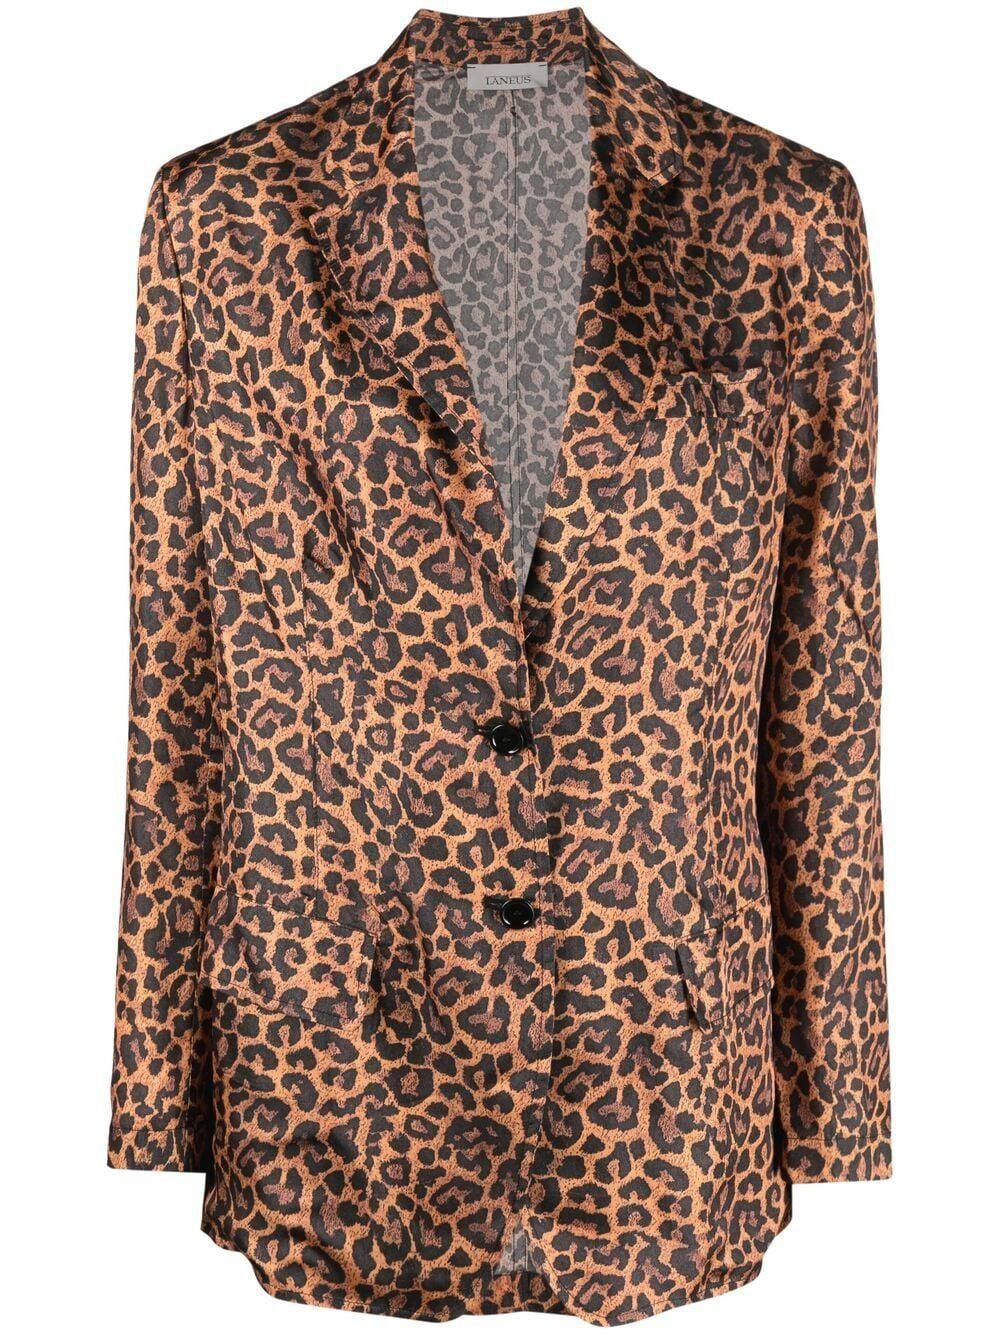 laneus leopard print single breasted blazer